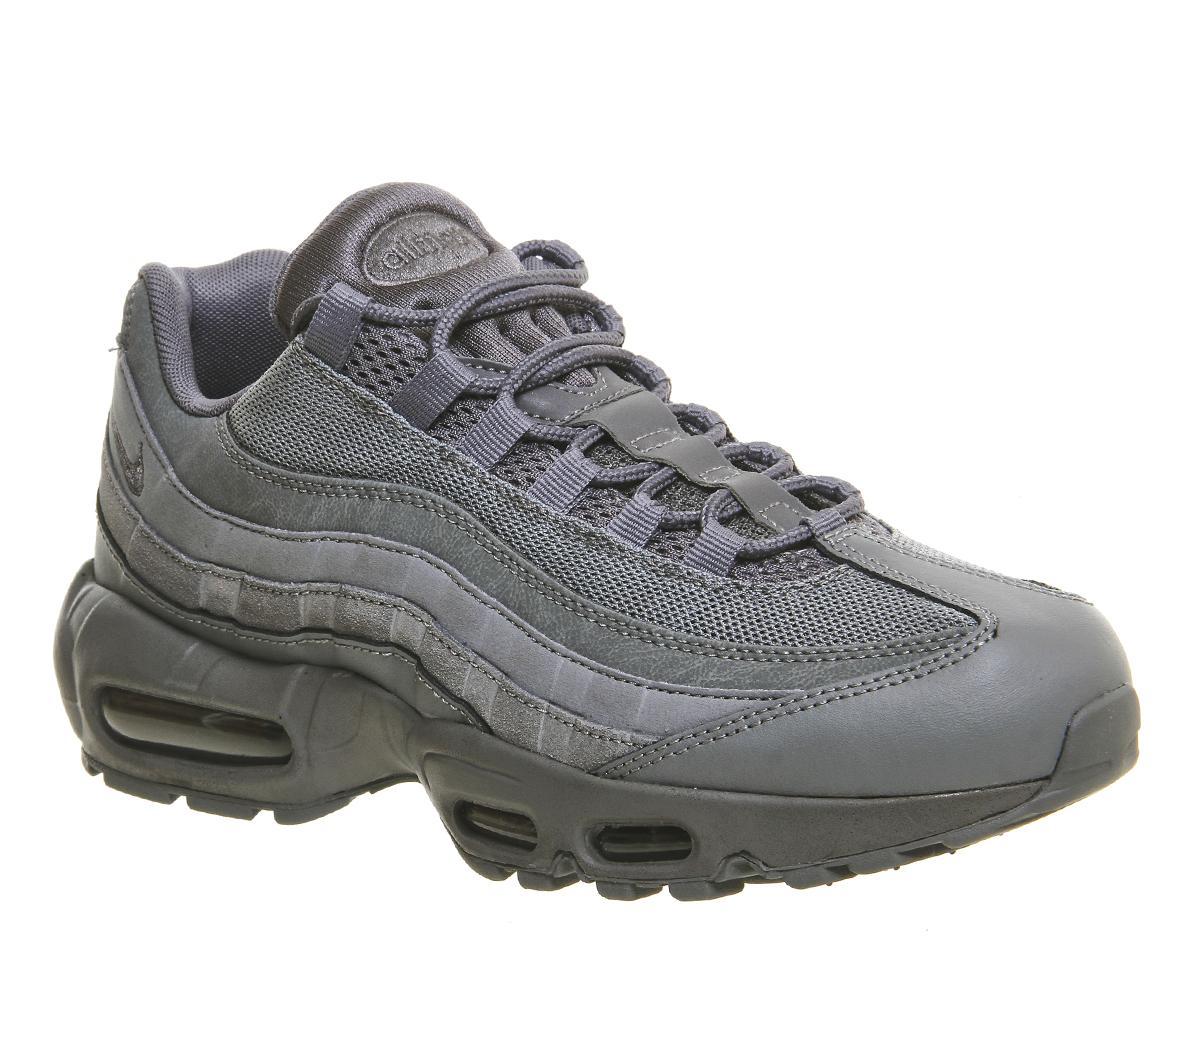 Nike Air Max 95 Cool Grey Sneaker Closer Look   HYPEBEAST